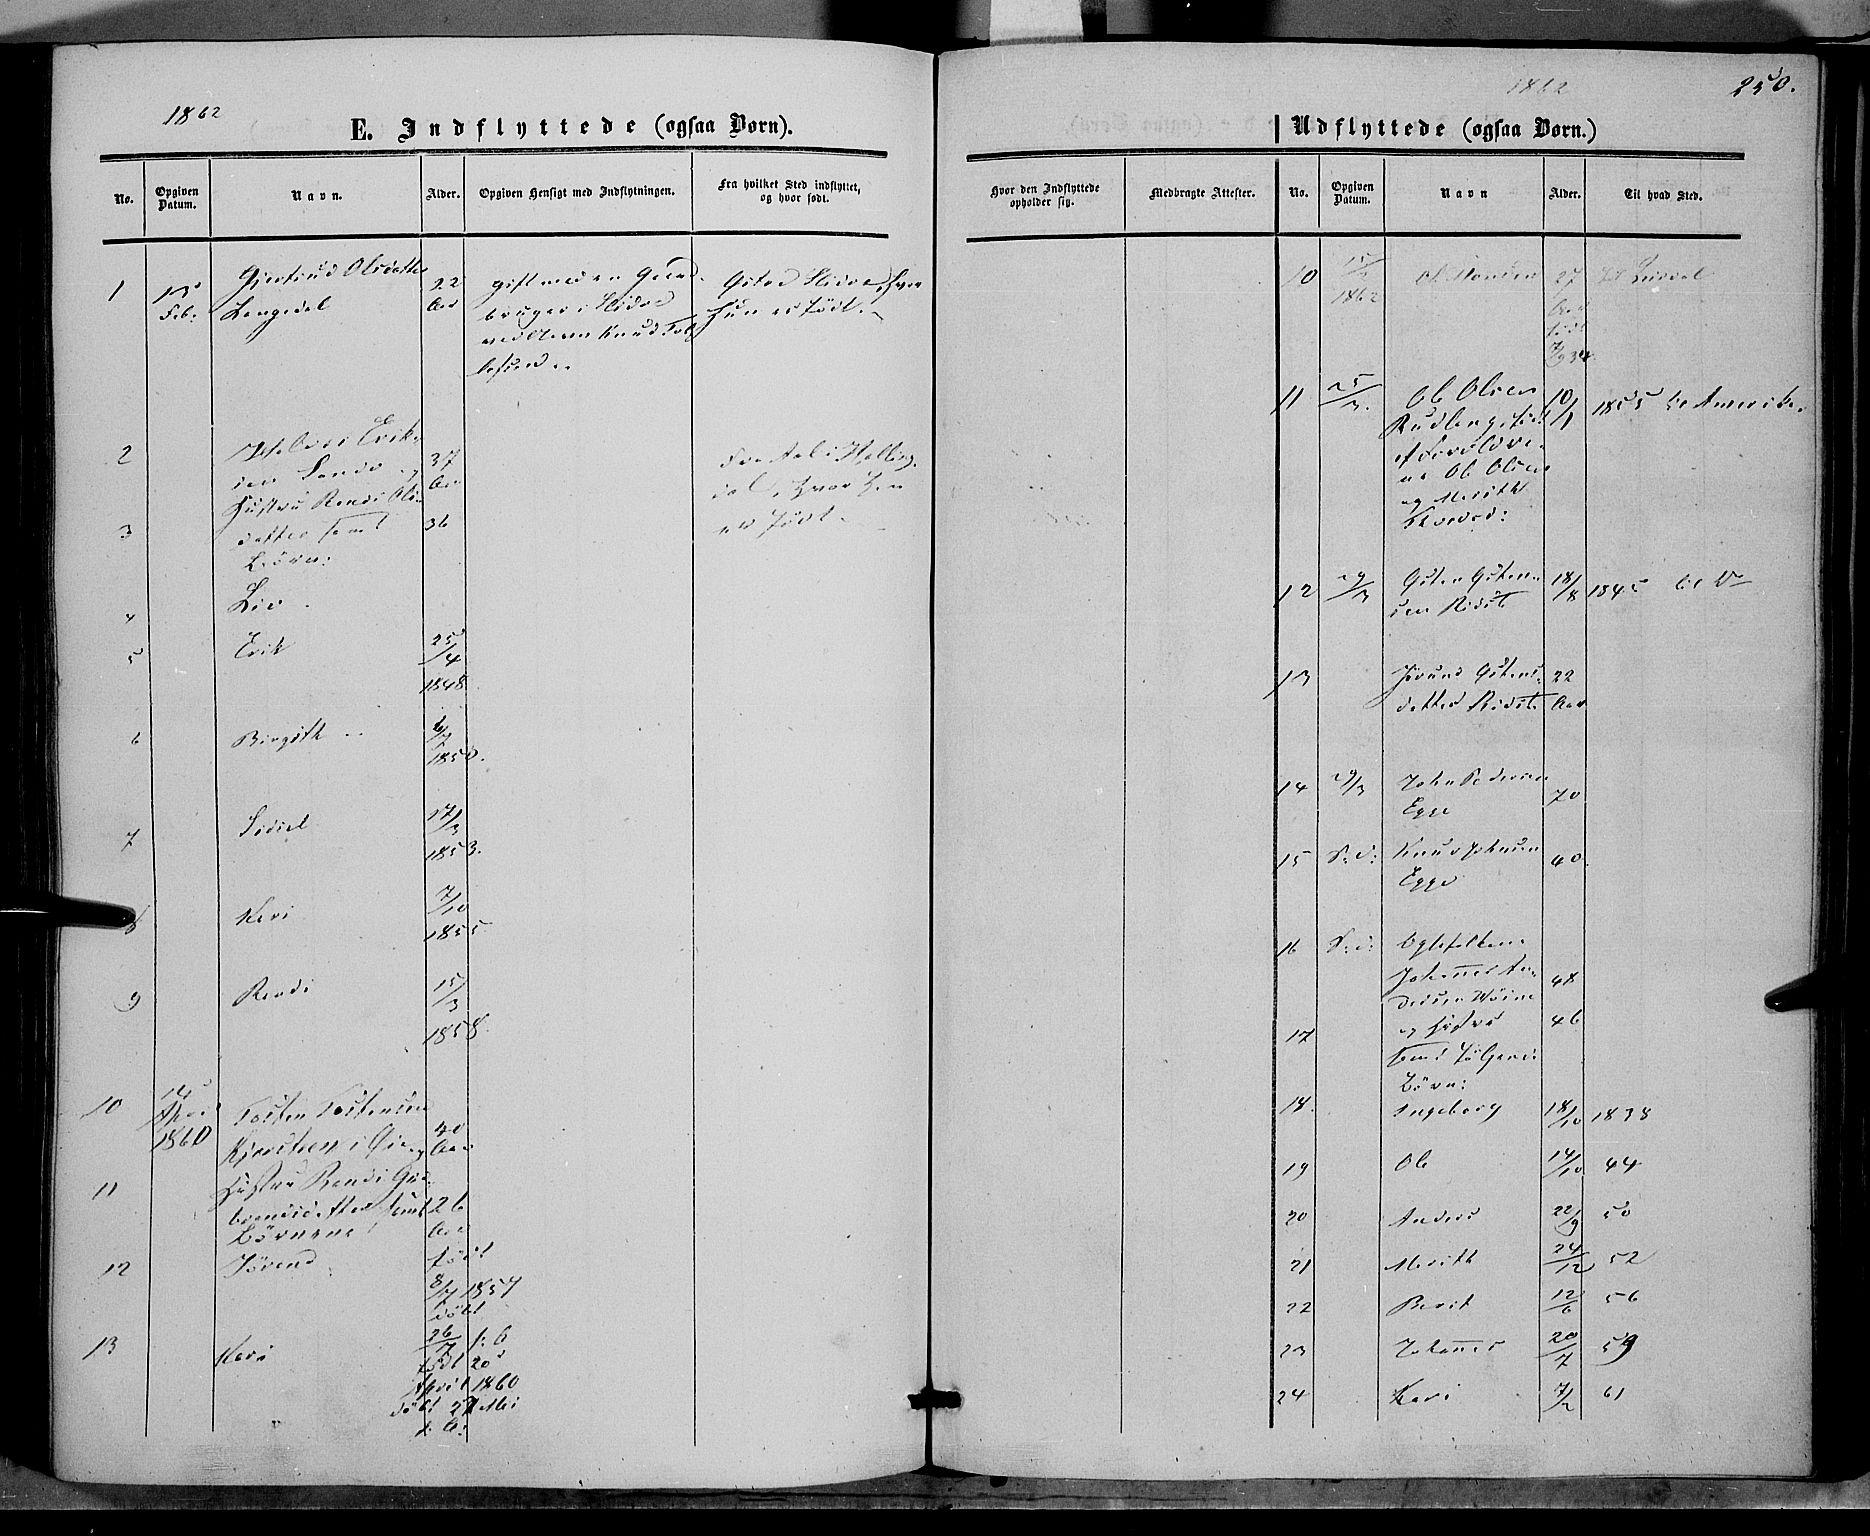 SAH, Vestre Slidre prestekontor, Ministerialbok nr. 2, 1856-1864, s. 250